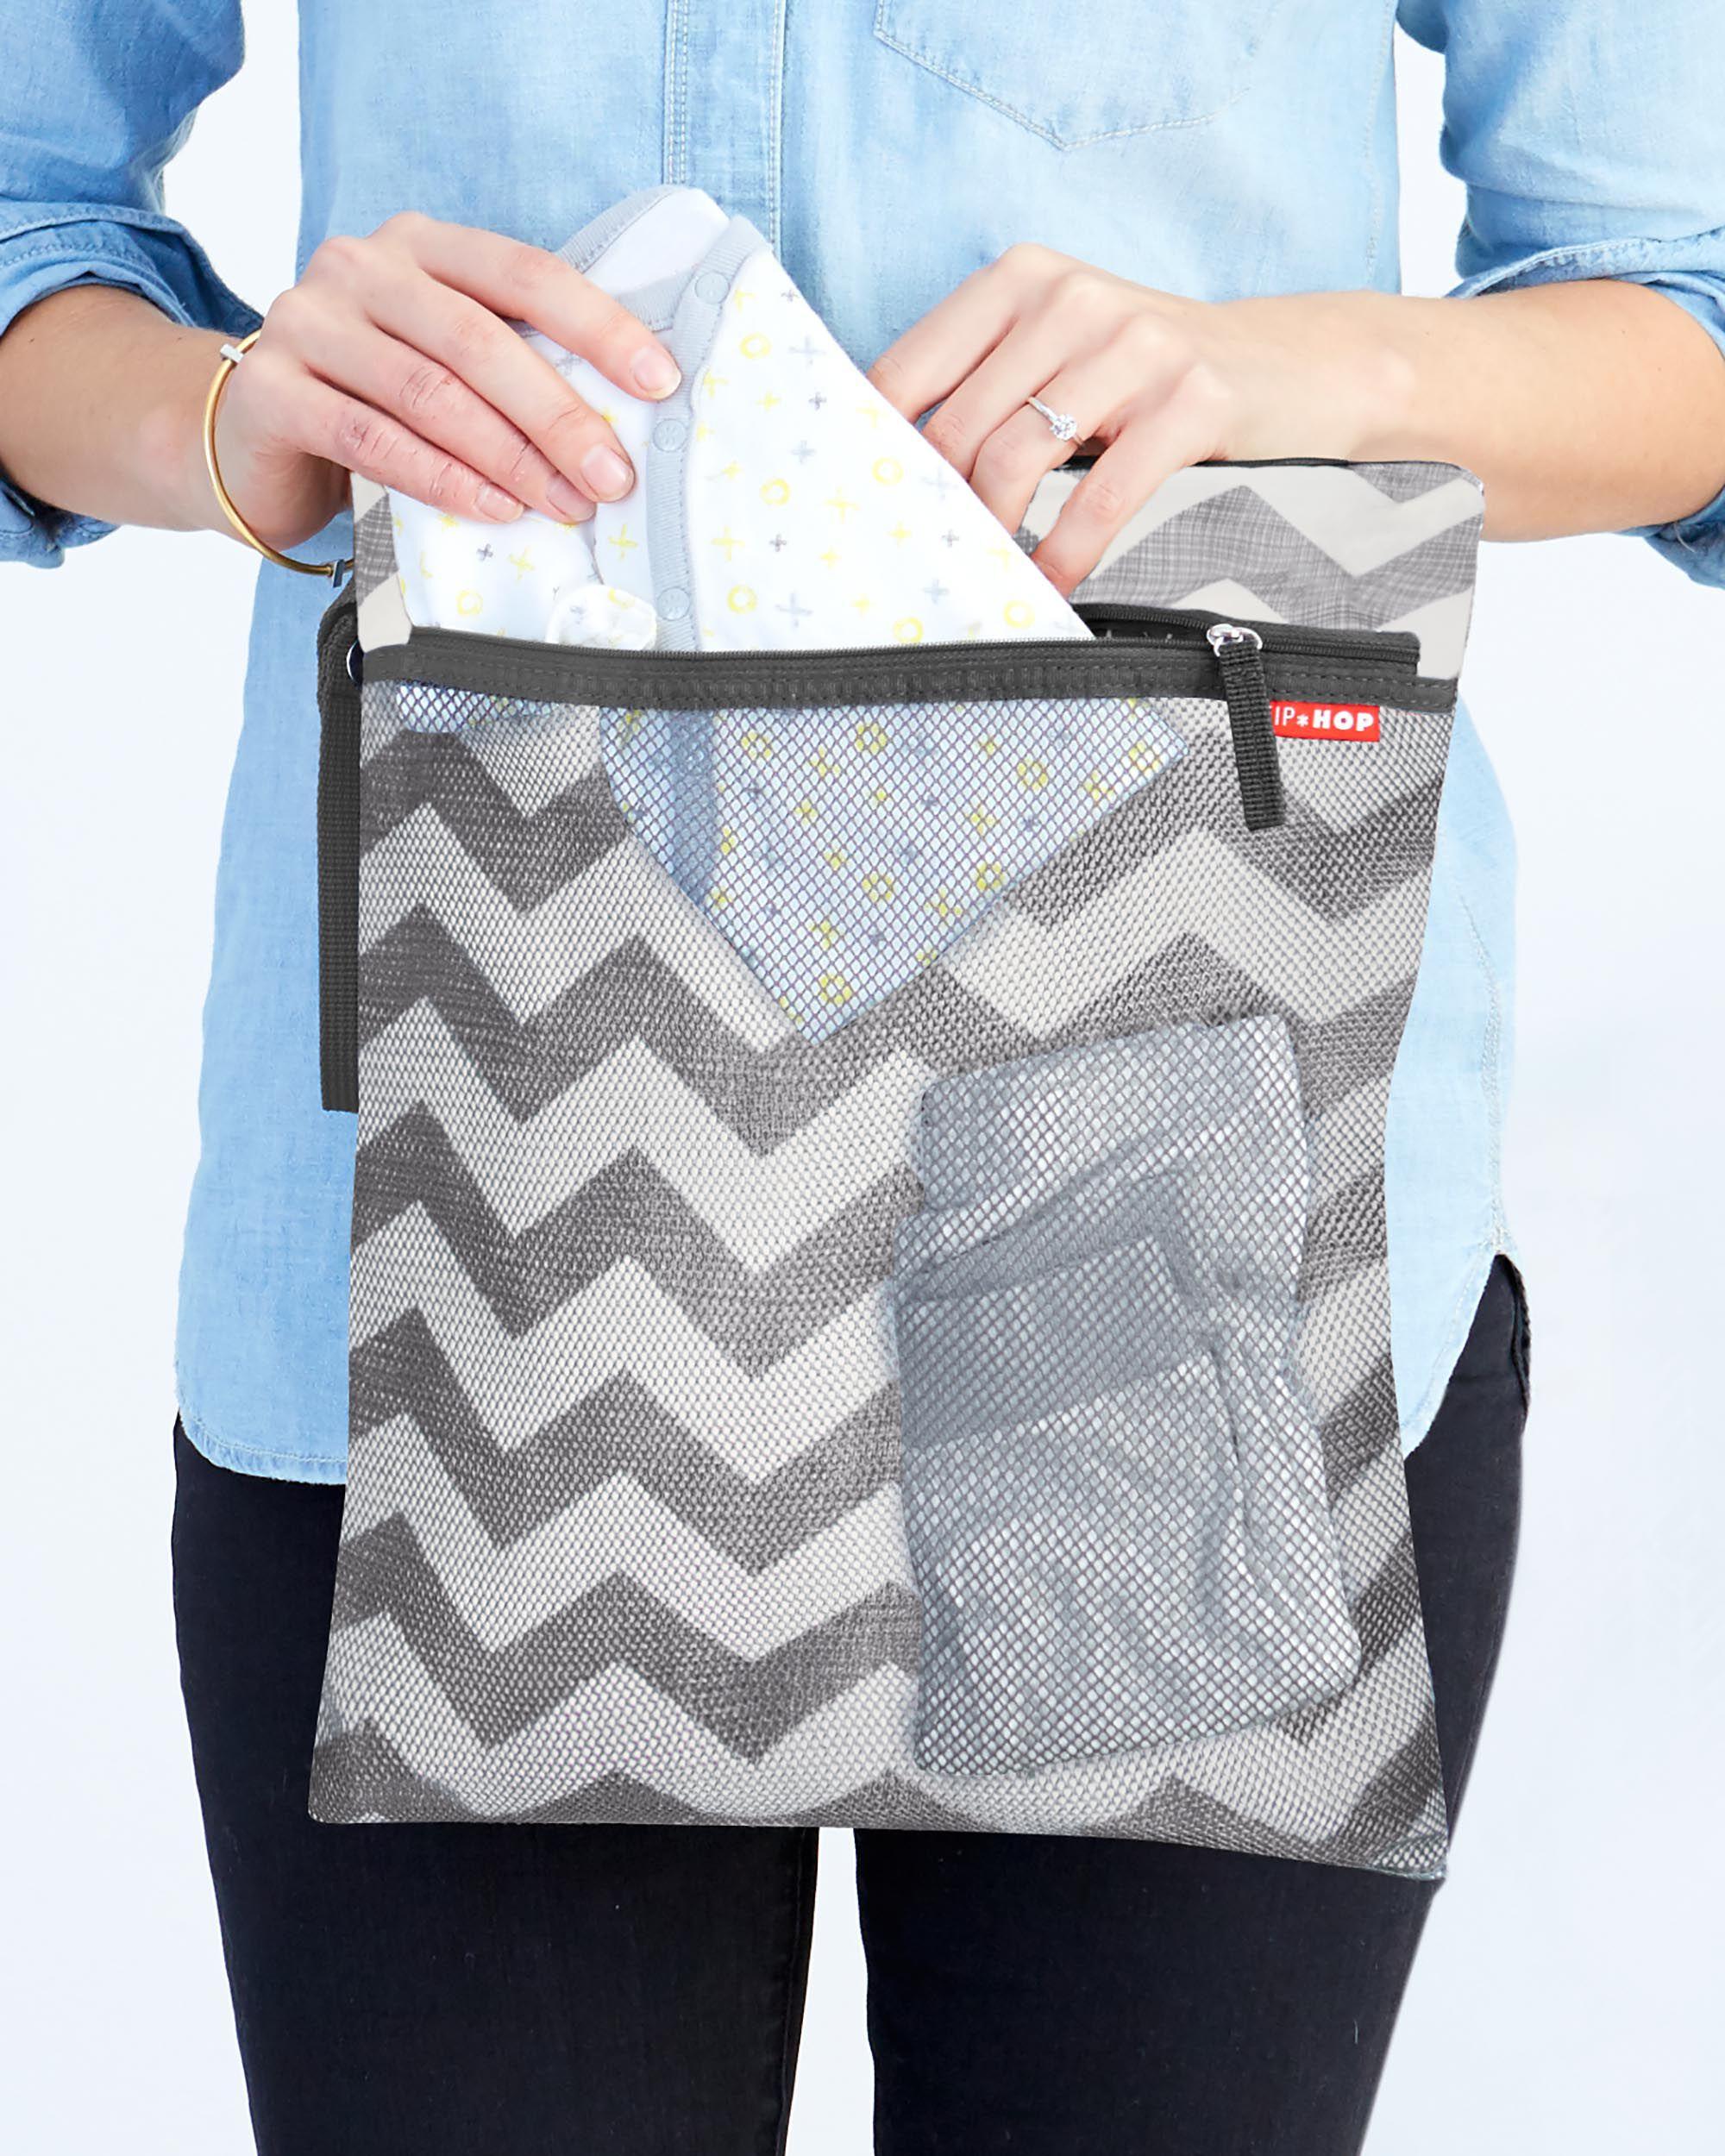 Grab Go Wet Dry Bag Skiphop Com